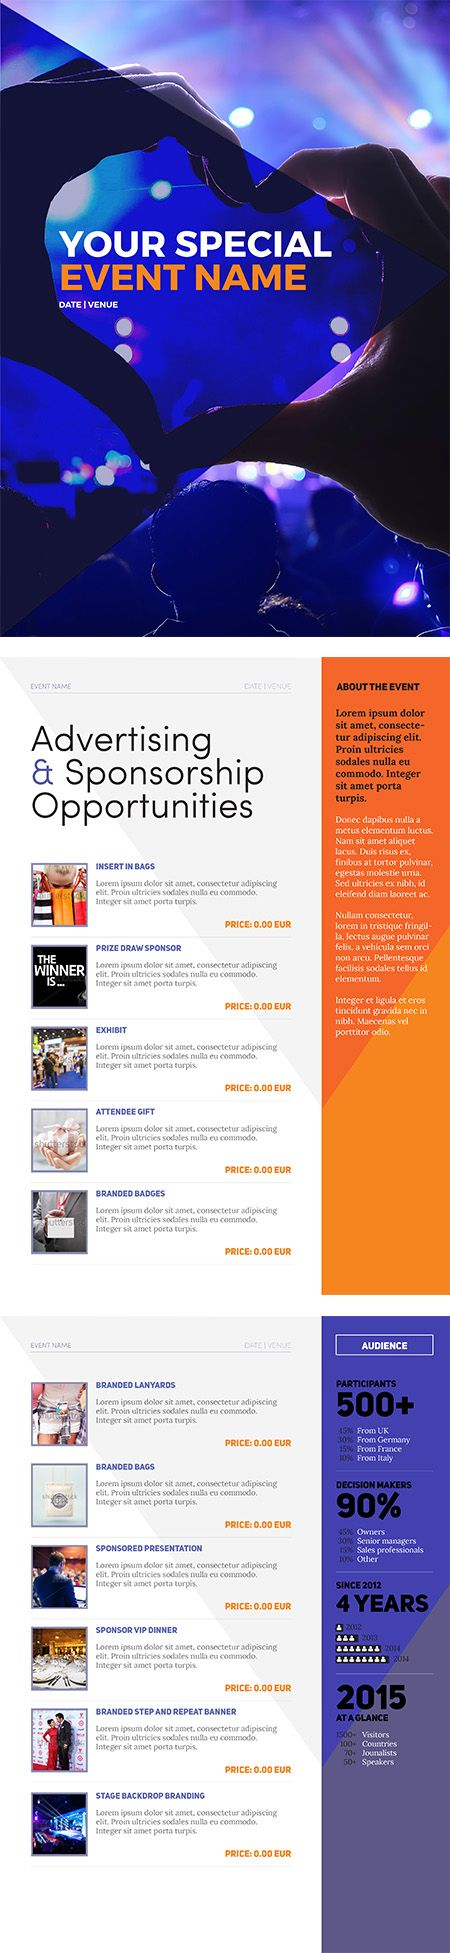 Sponsorship Package Template Event Sponsorship Sponsorship Package Nonprofit Events Non profit sponsorship package template